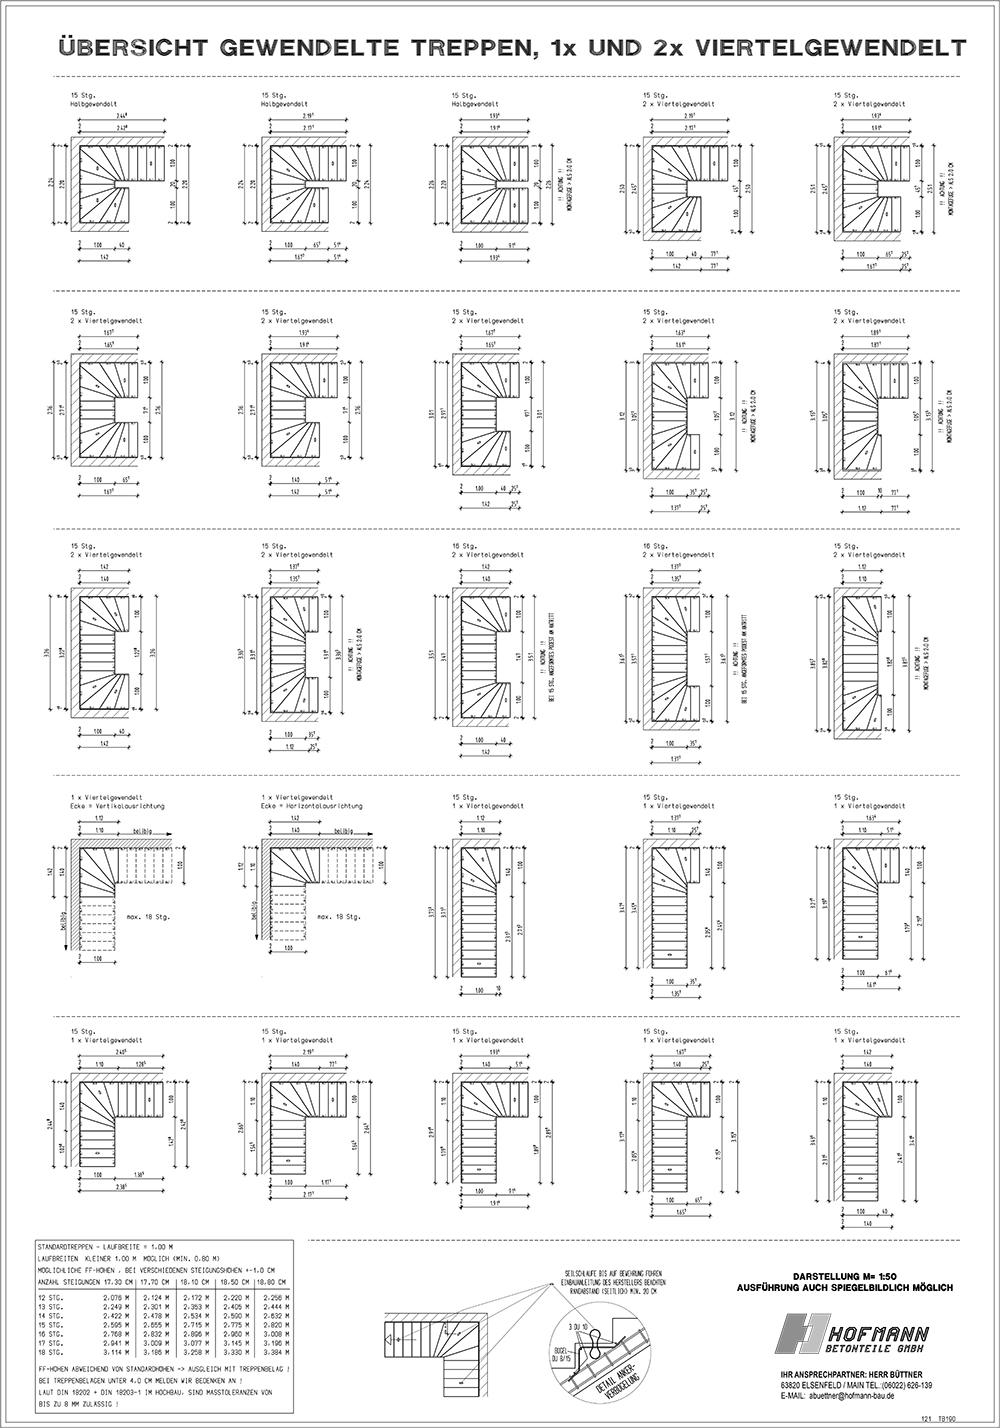 einzigartig treppe verziehen haus design ideen. Black Bedroom Furniture Sets. Home Design Ideas